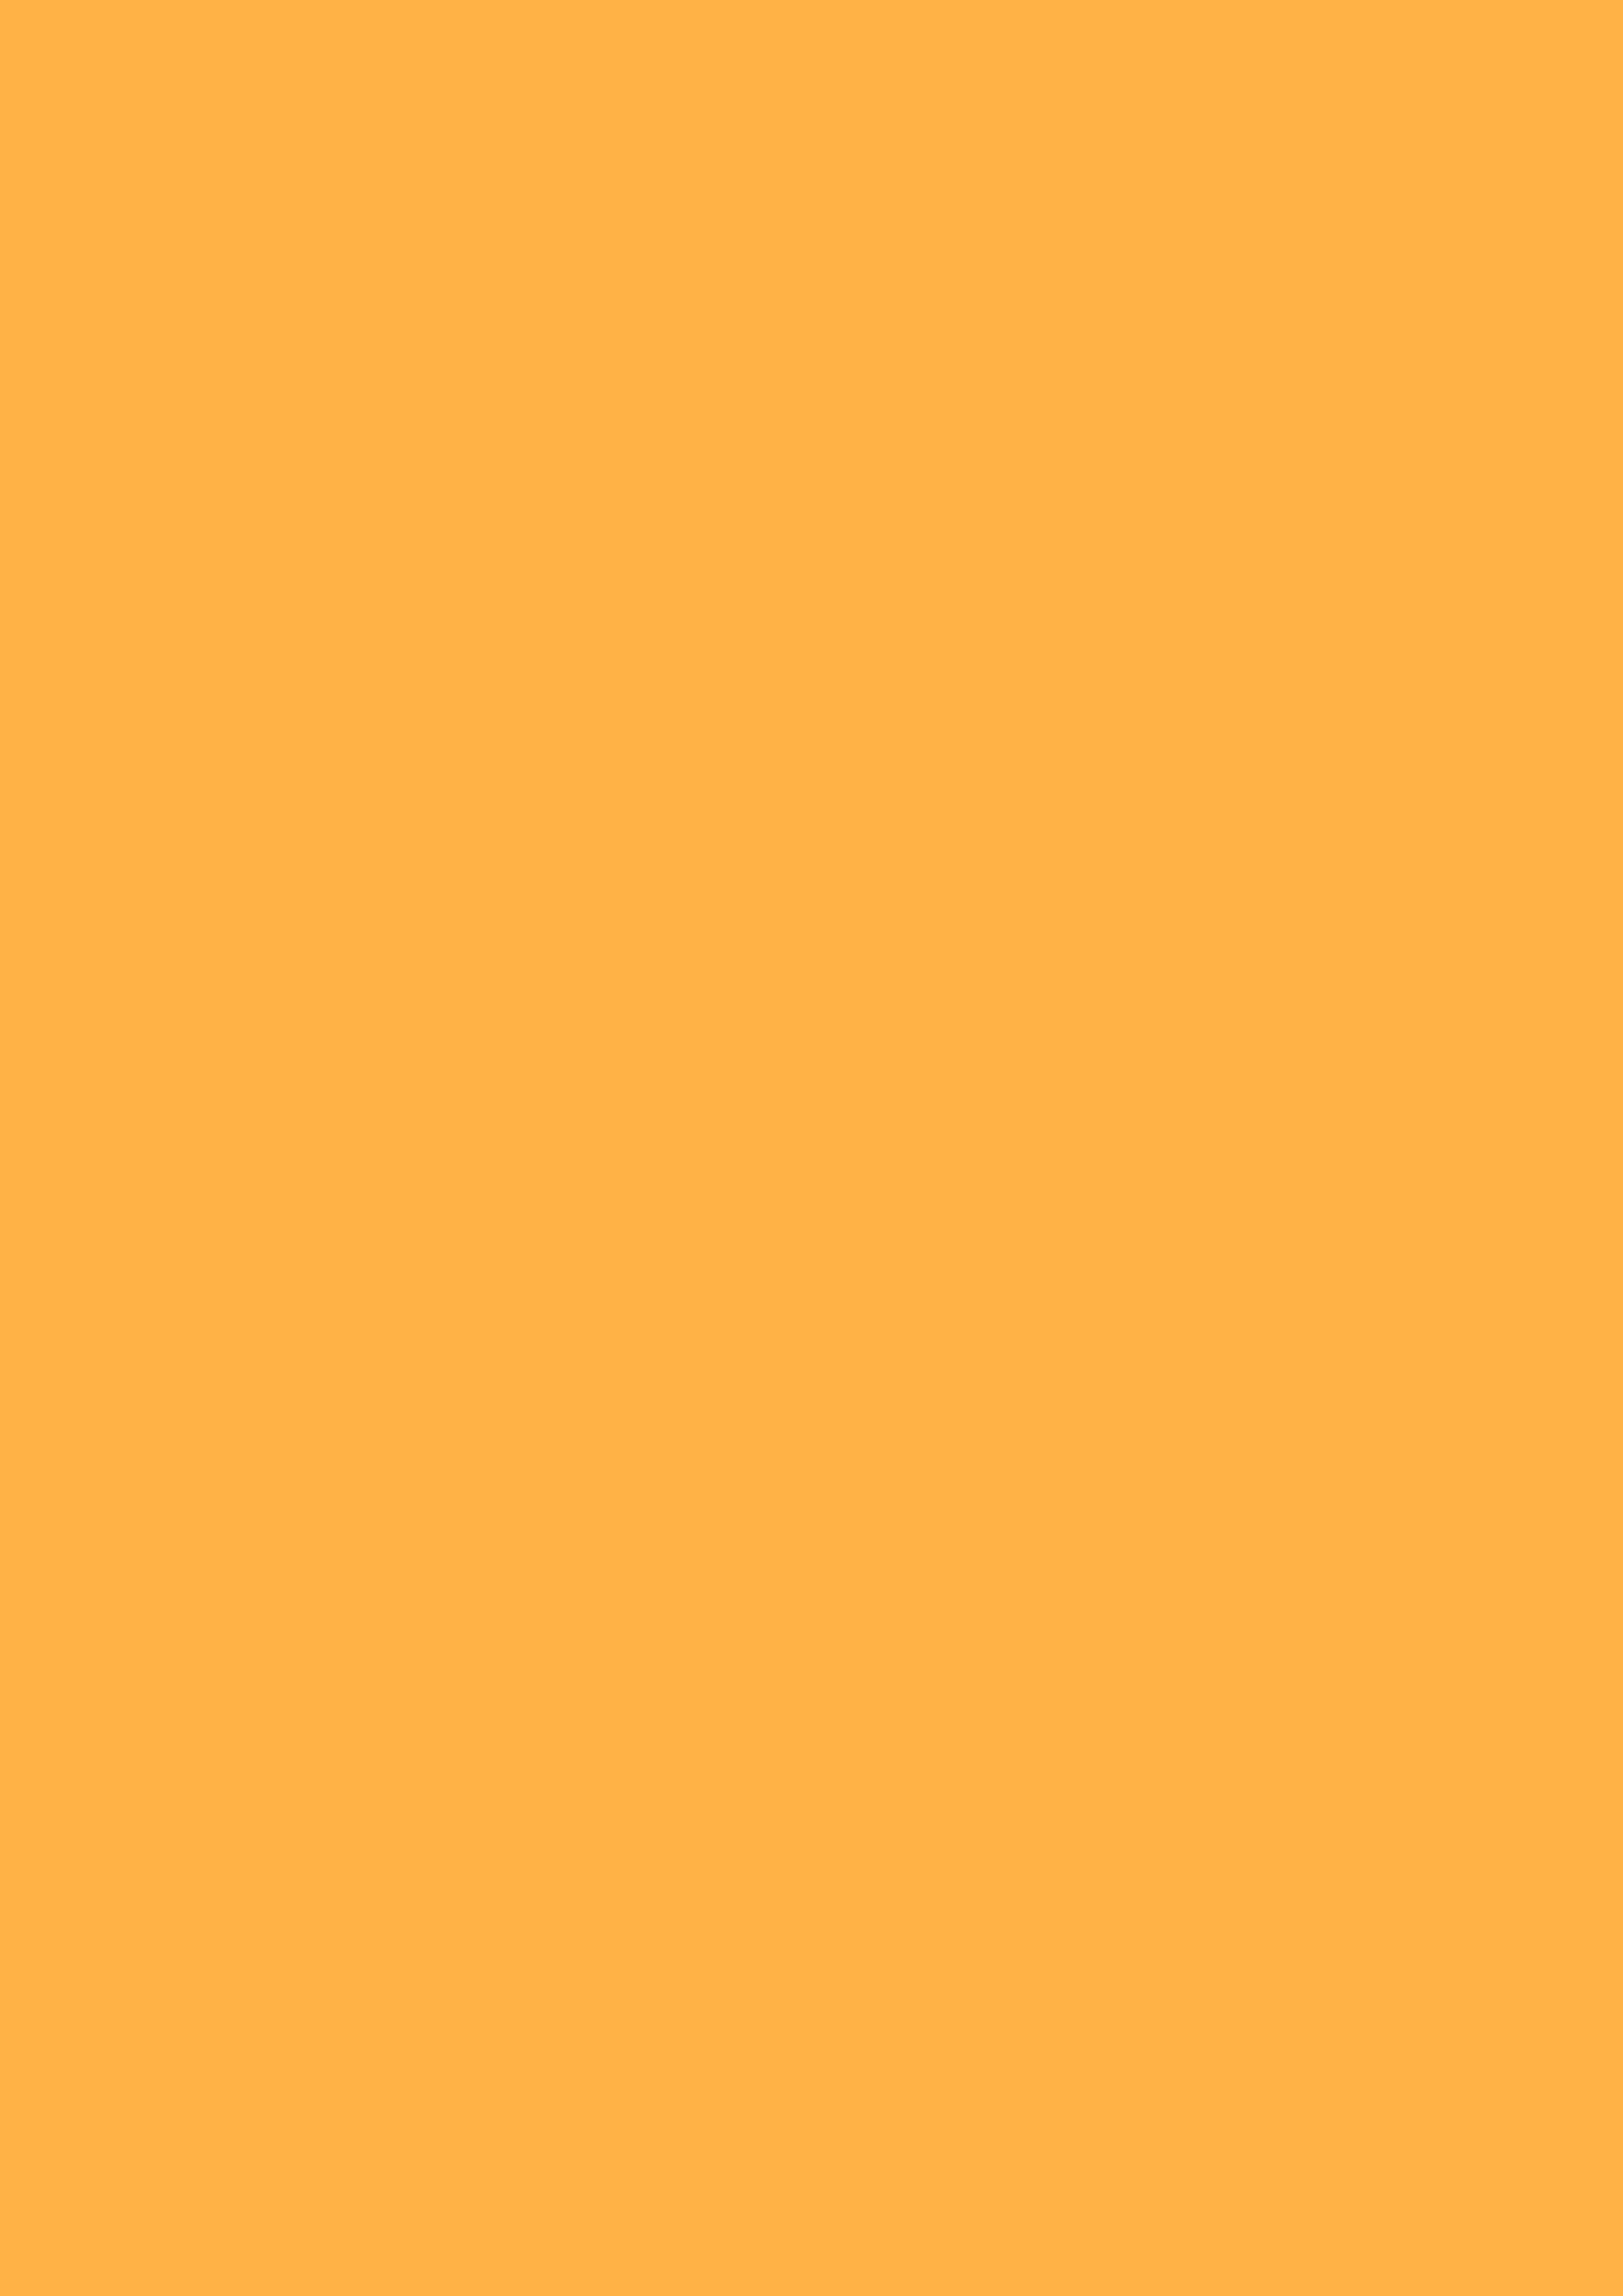 2480x3508 Pastel Orange Solid Color Background